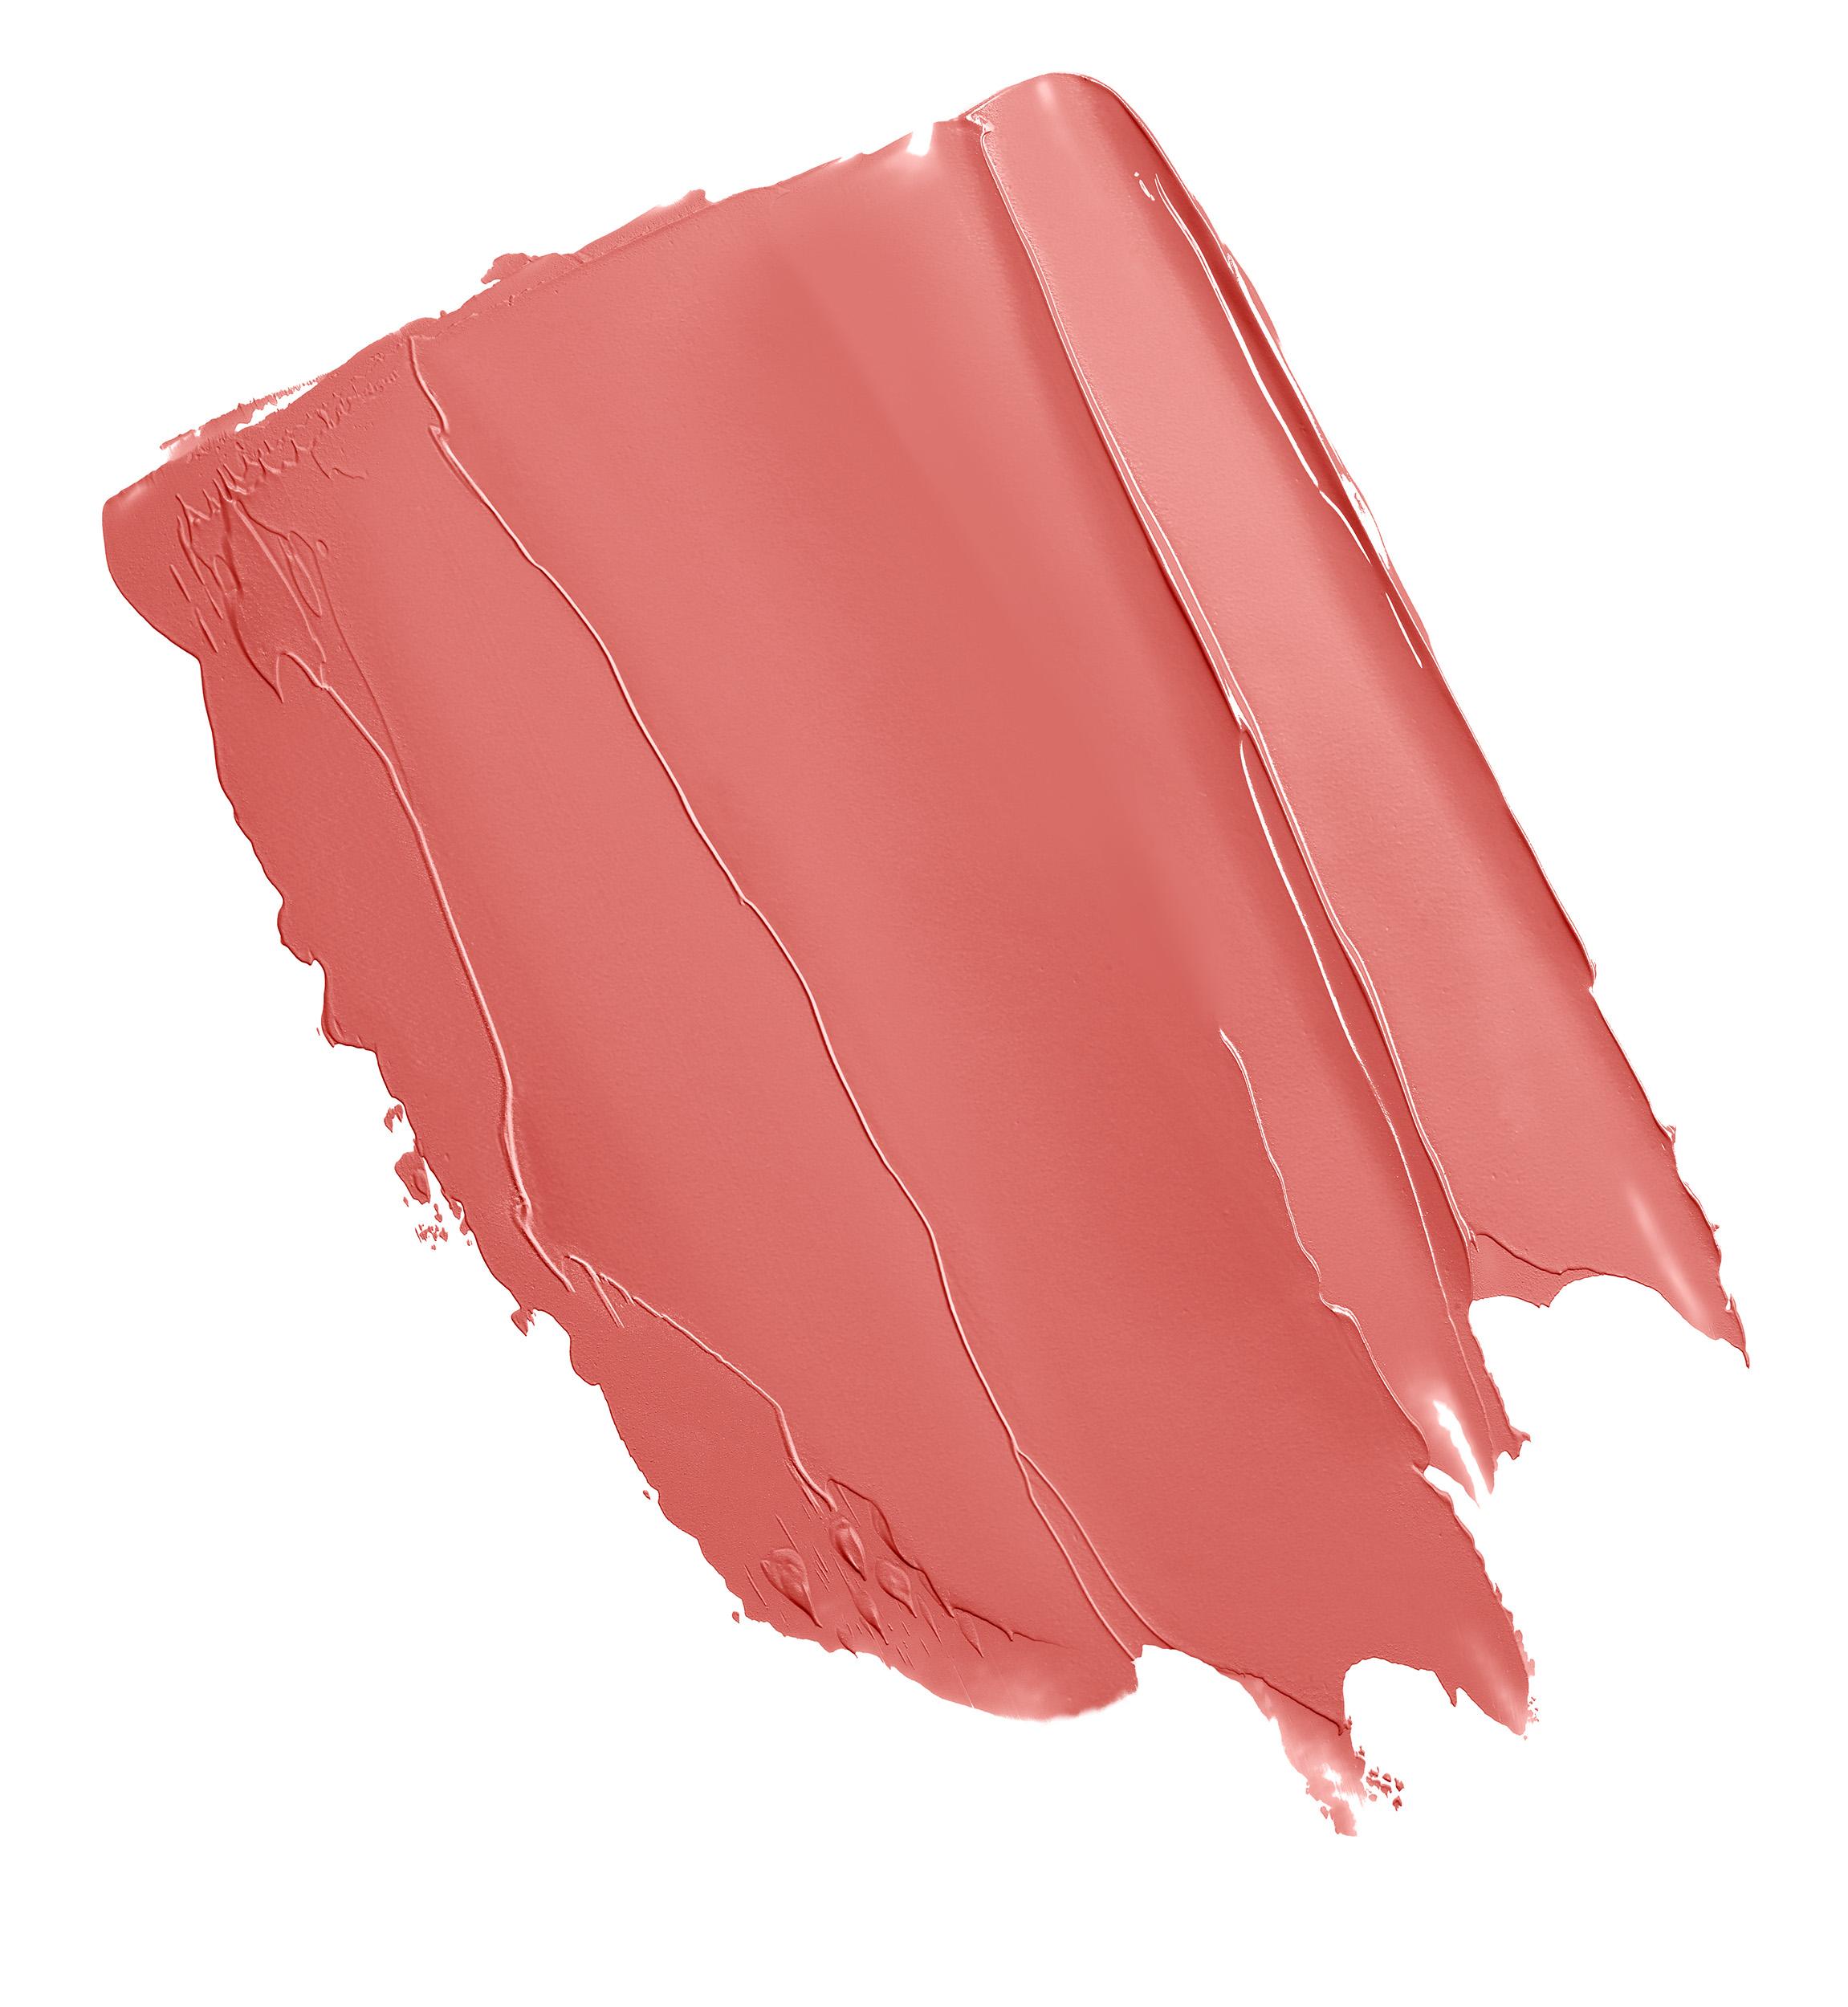 DIOR Rouge Dior Refillable Satin Lipstick, 241 pink sakura